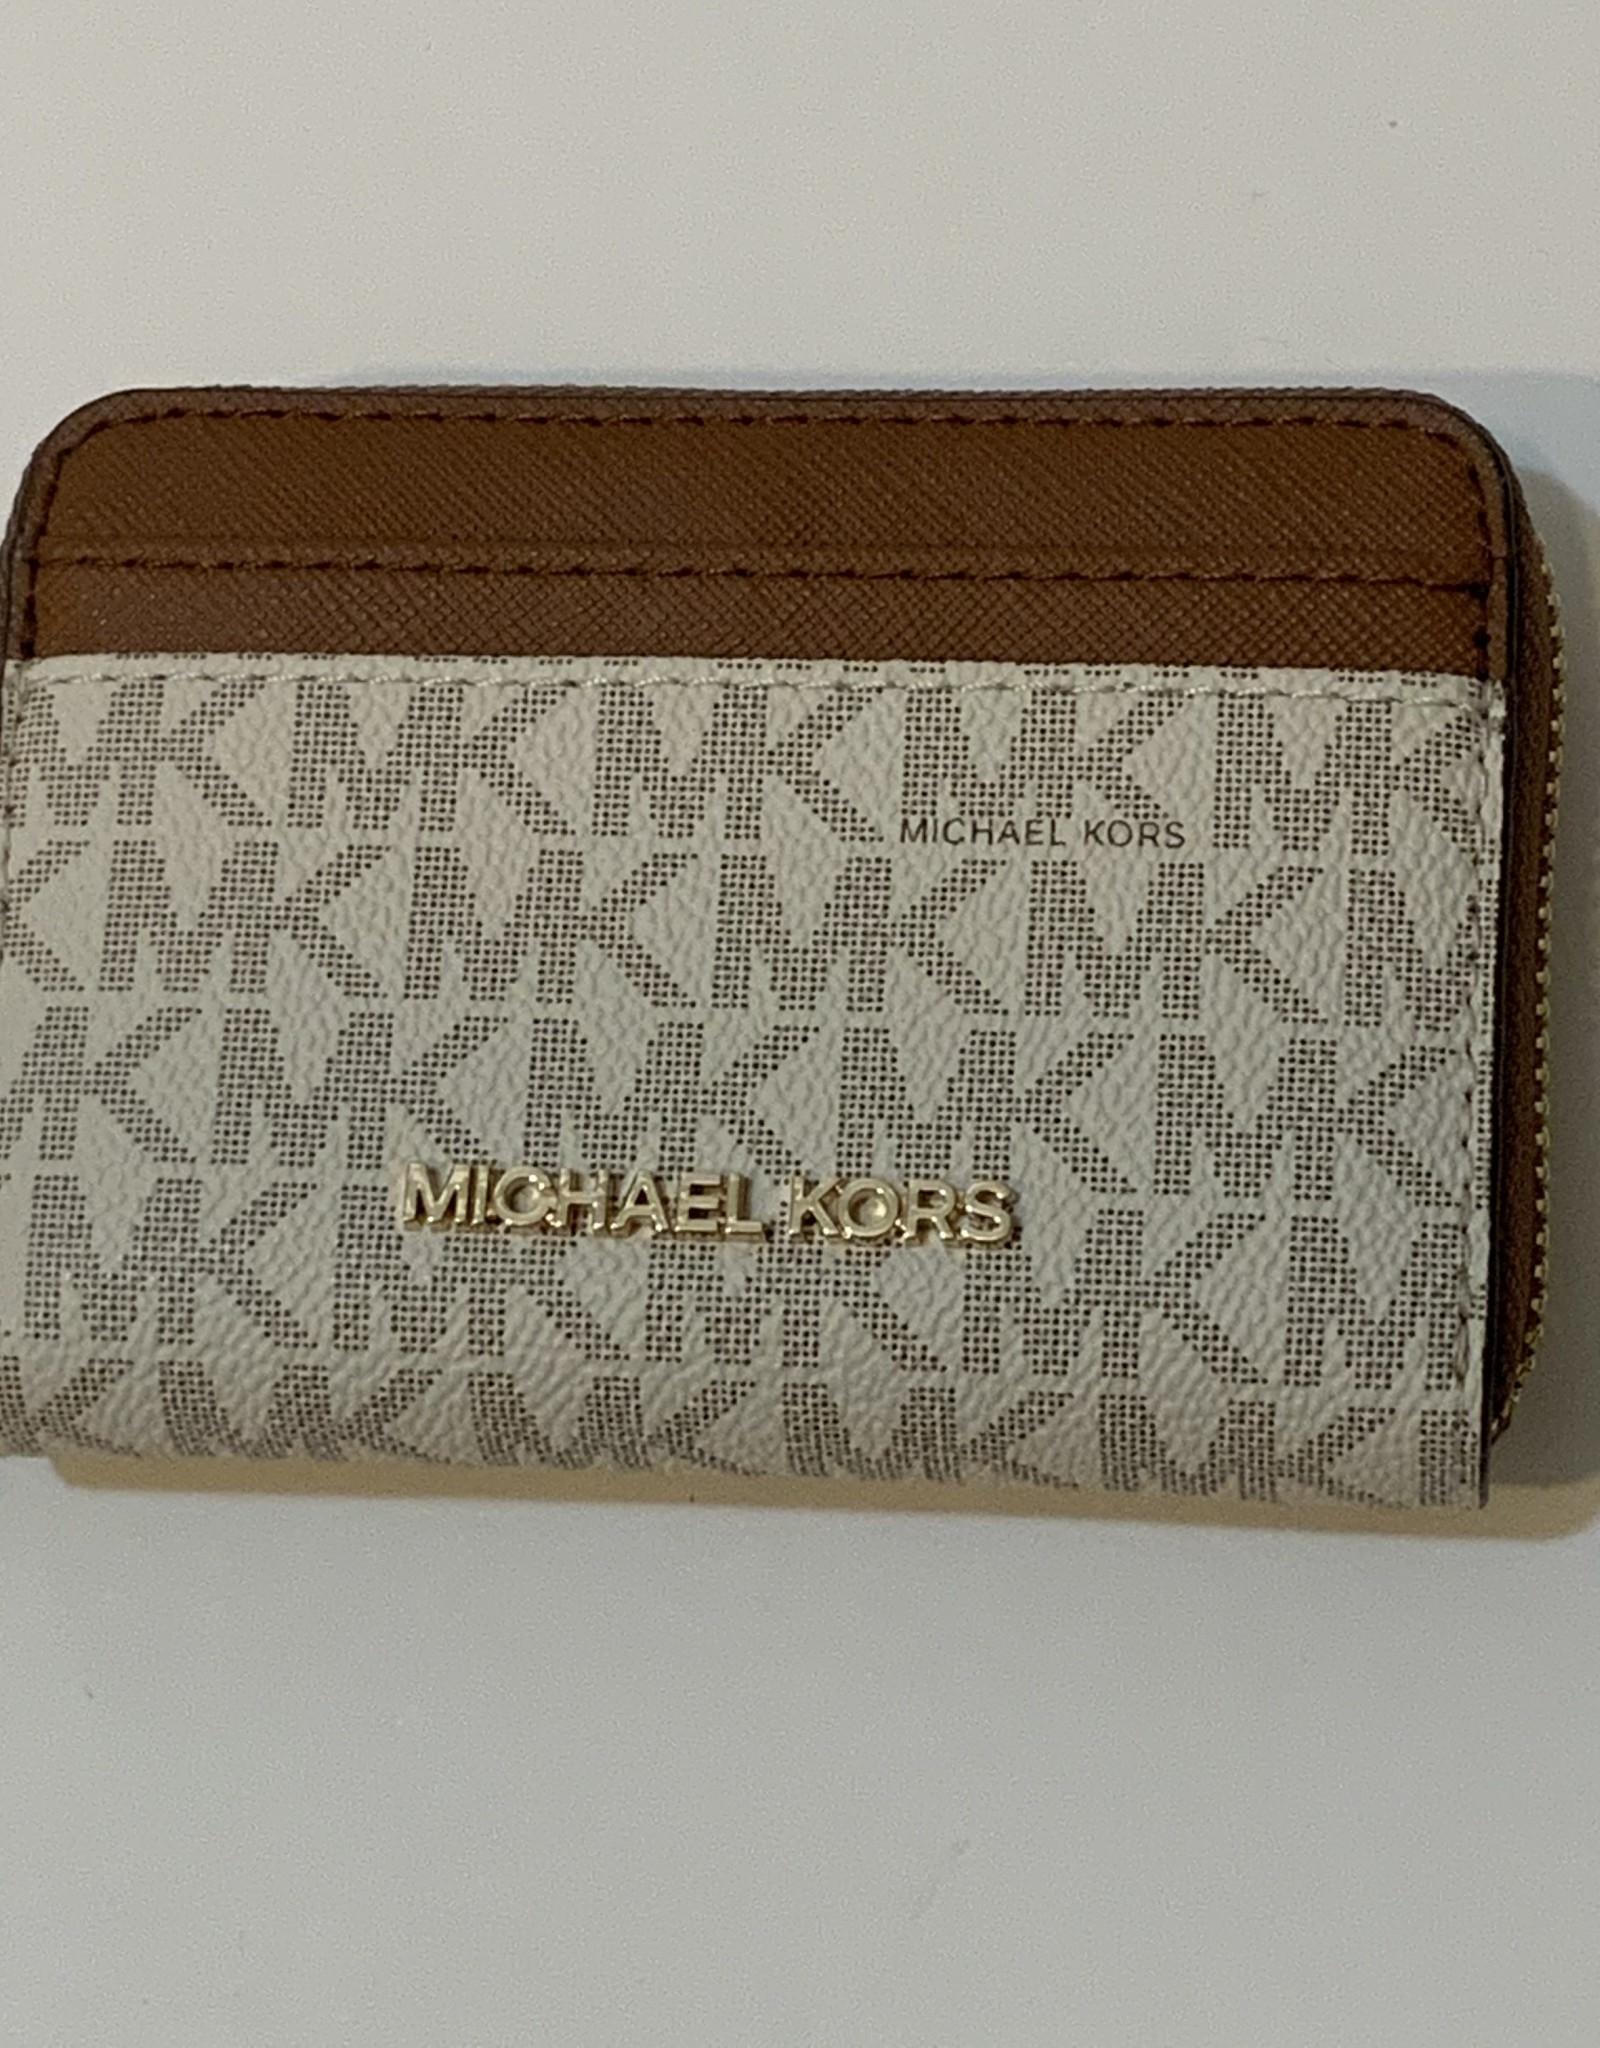 Michael Kors Michael Kors Card Case with Zip Jet Set Travel